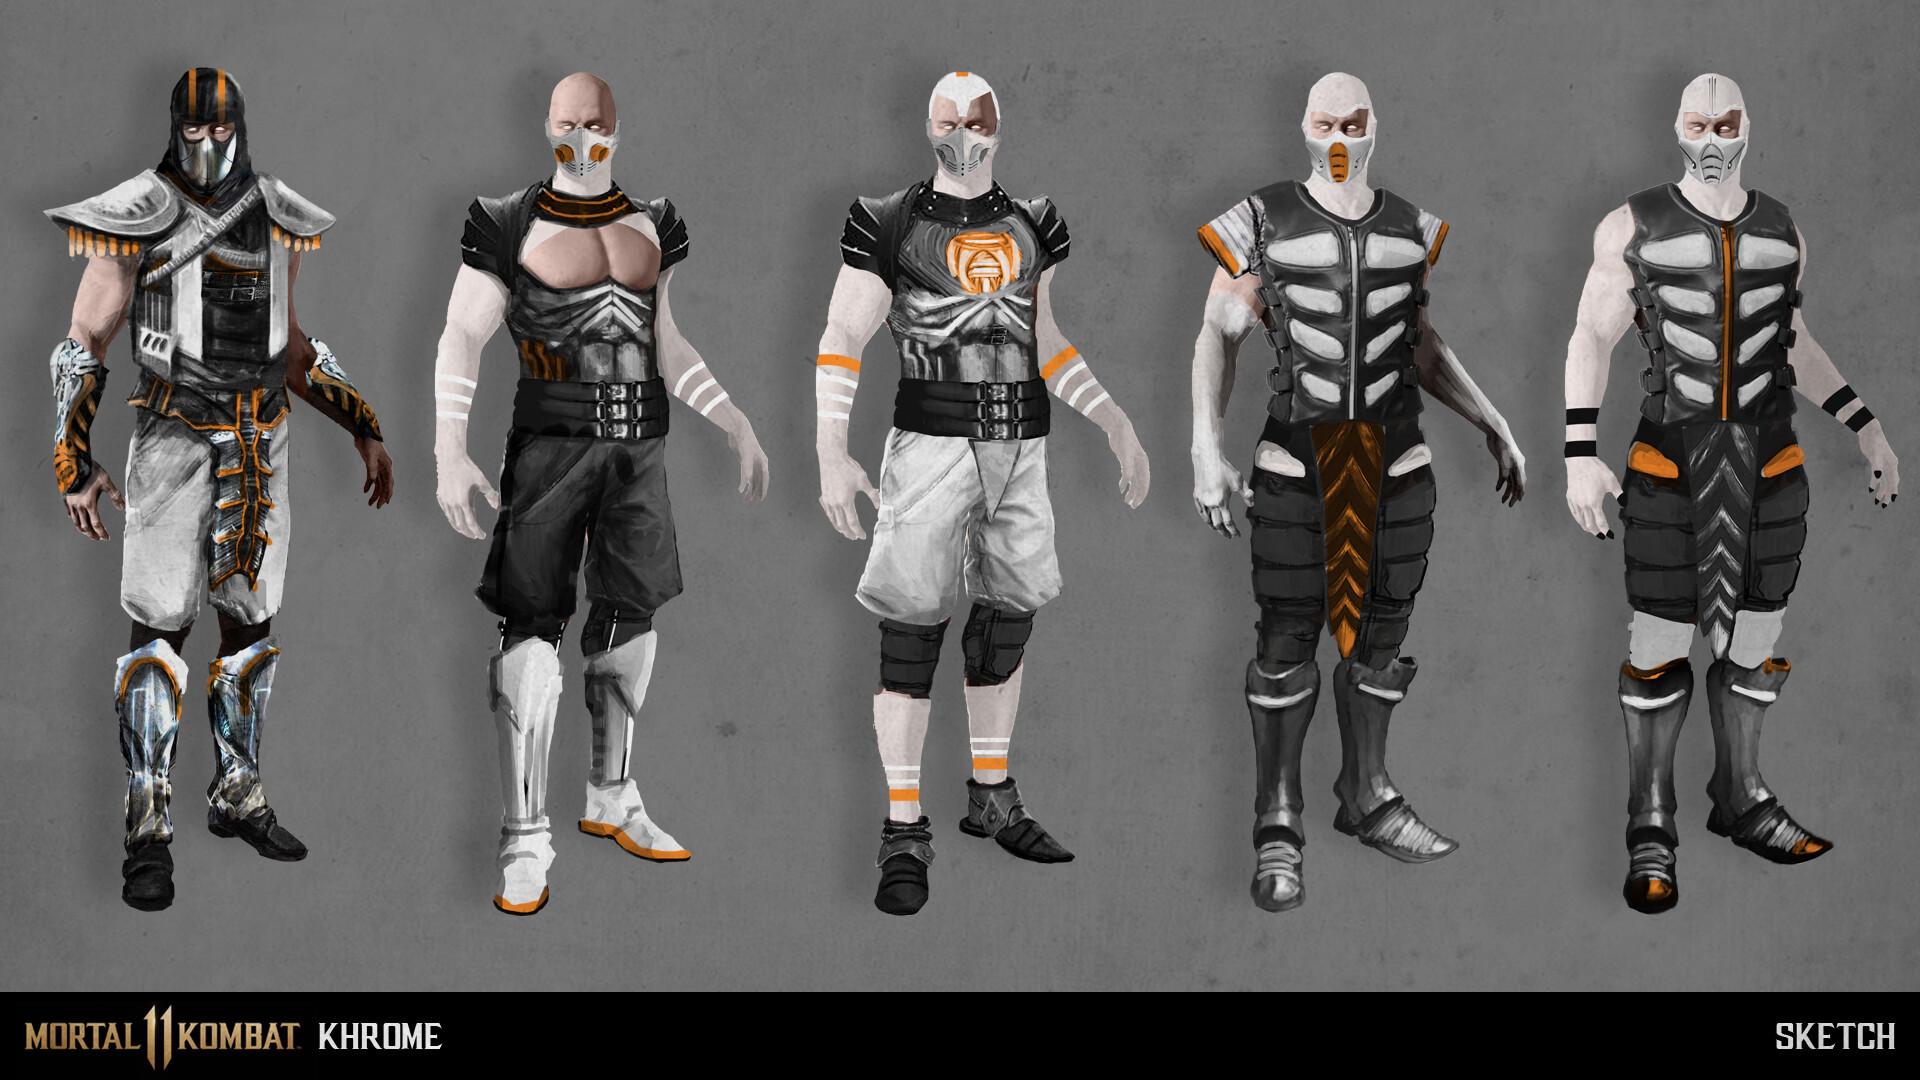 Mortal Kombat 11 character re-design: KHROME PROPOSAL   Test